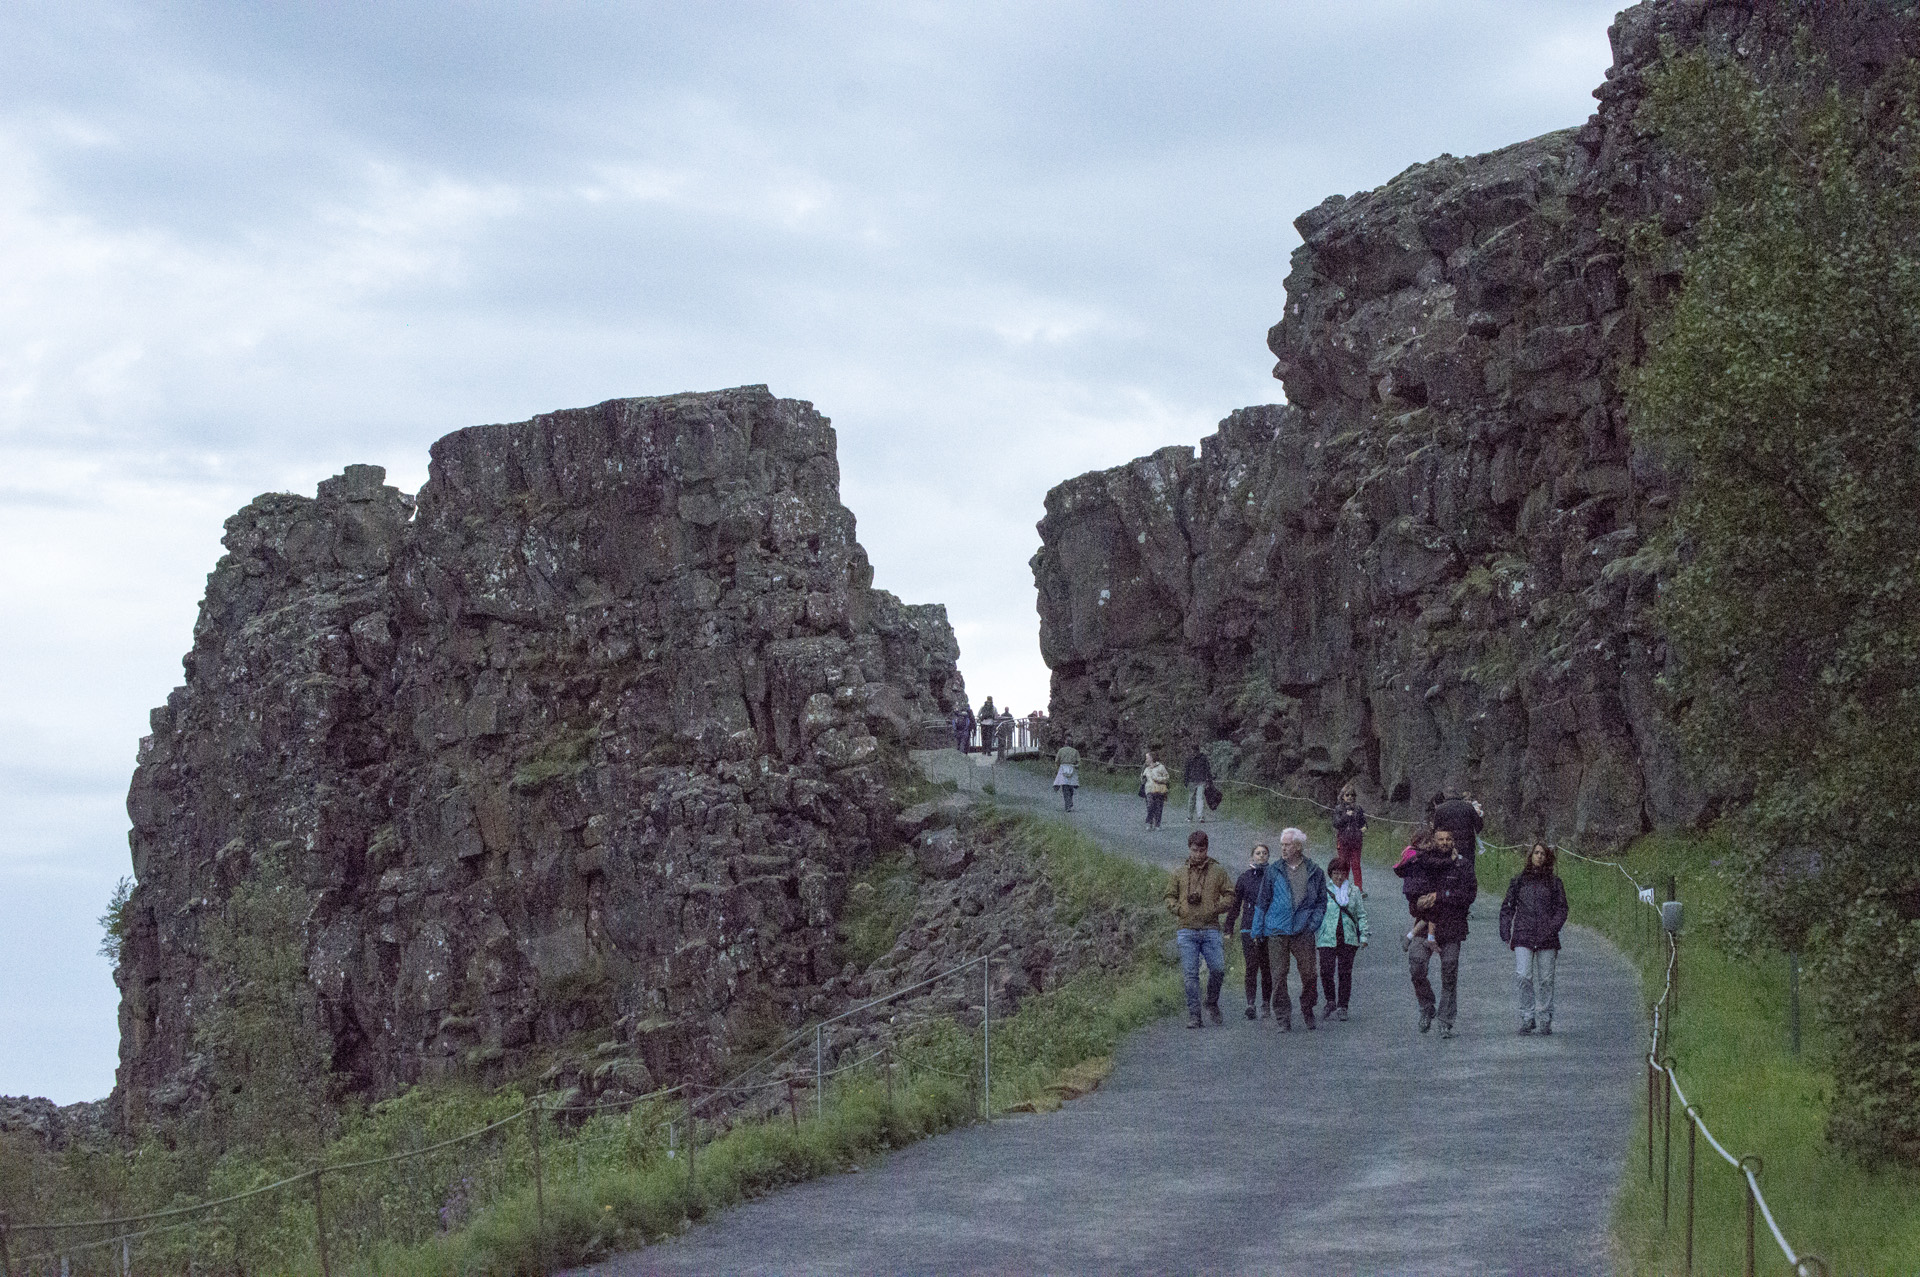 Rift valley along the Mid-Atlantic Ridge, Þingvellir National Park, Suðurland region, Iceland. North American plate is on the right.